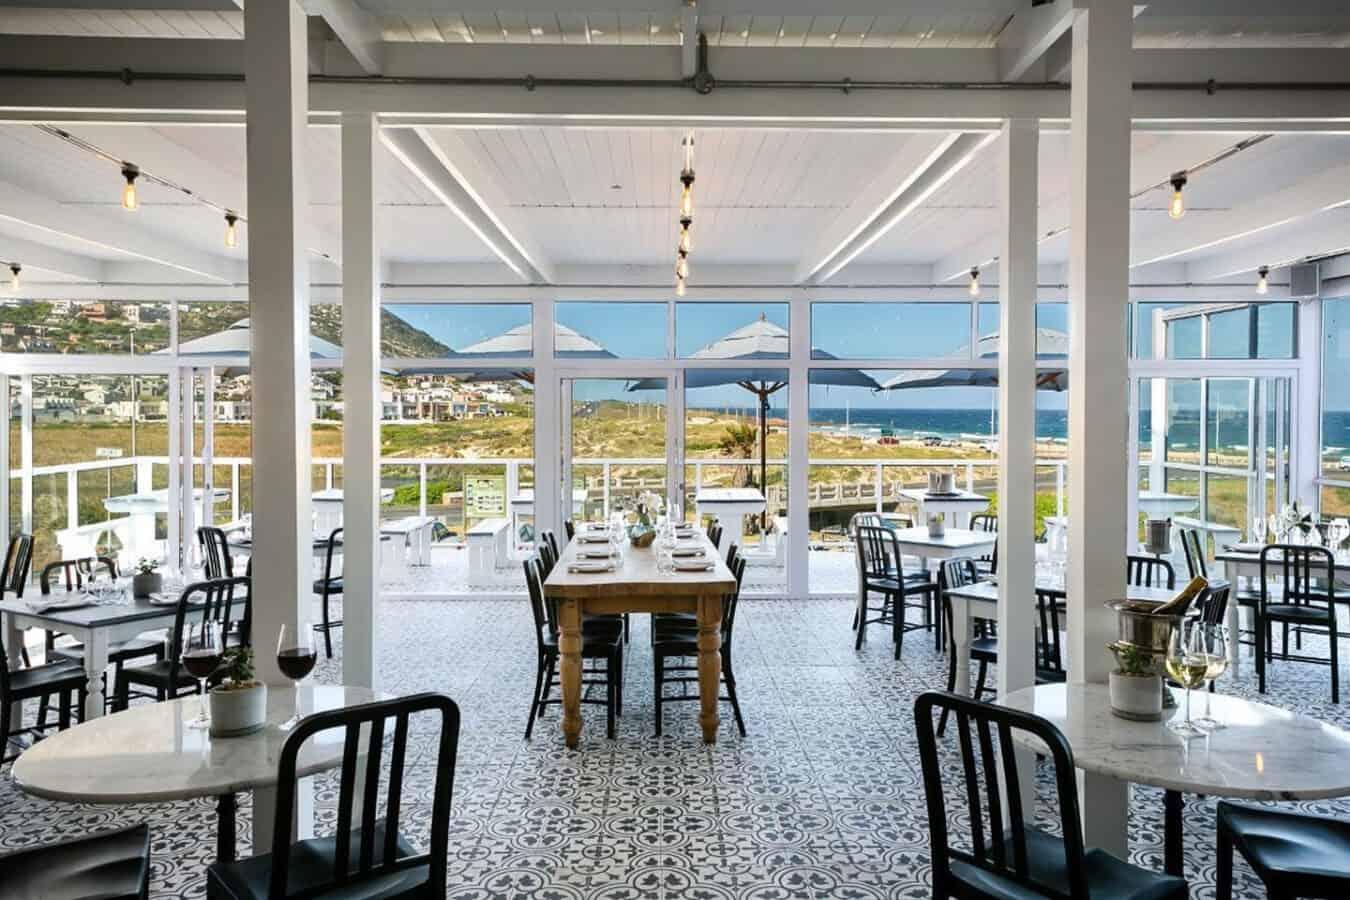 Top 15 Outdoor Restaurants Cape Town (Covid Friendly Restaurants Cape Town)